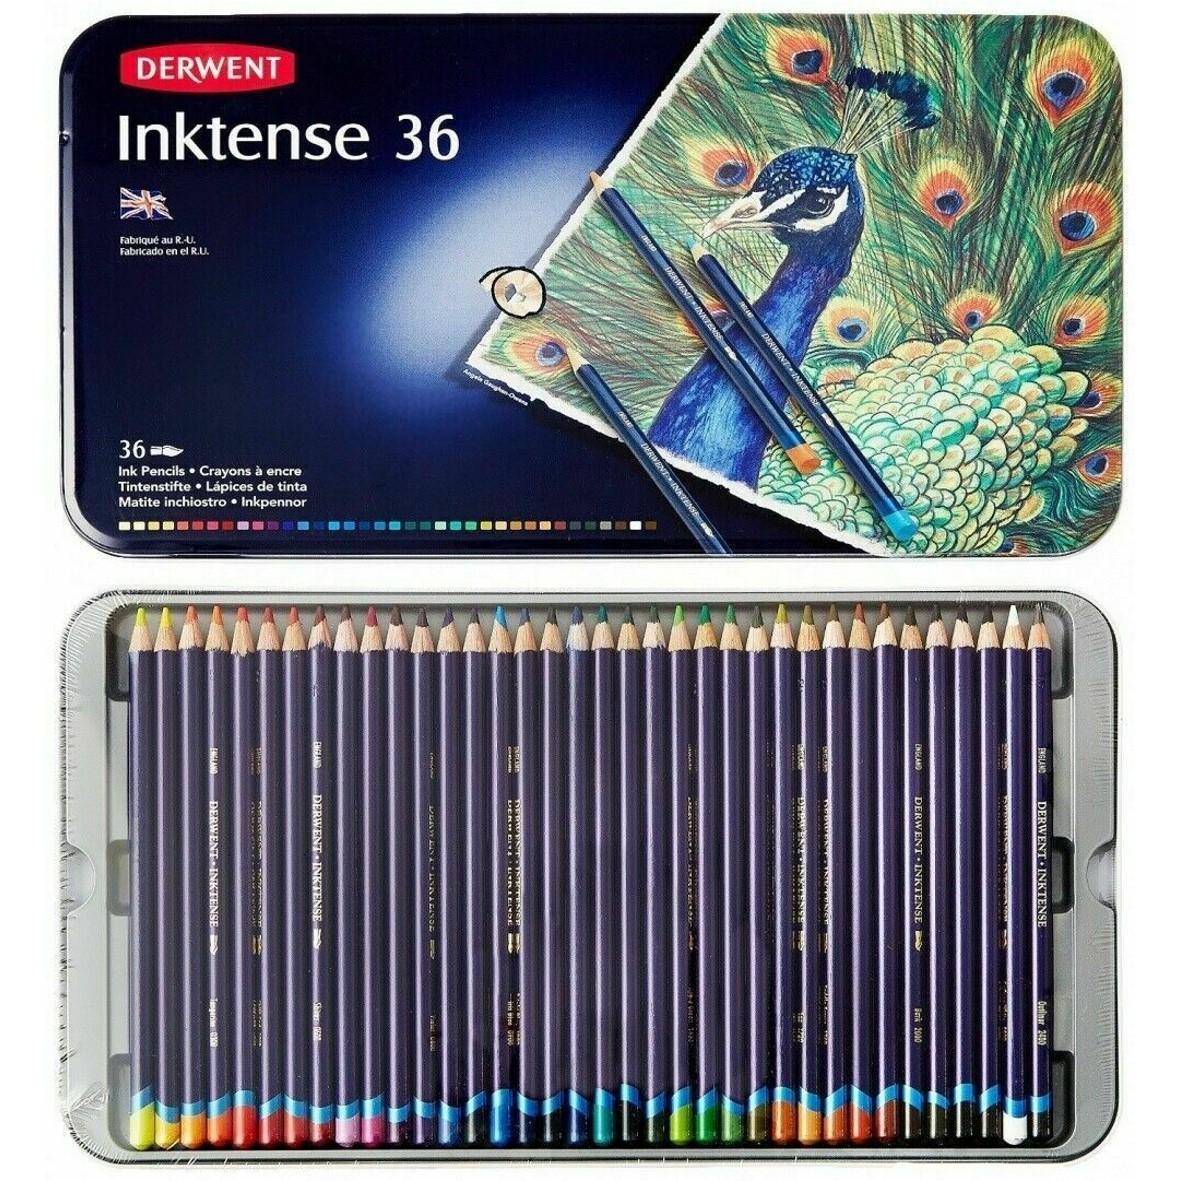 Inktense Pencils set of 36